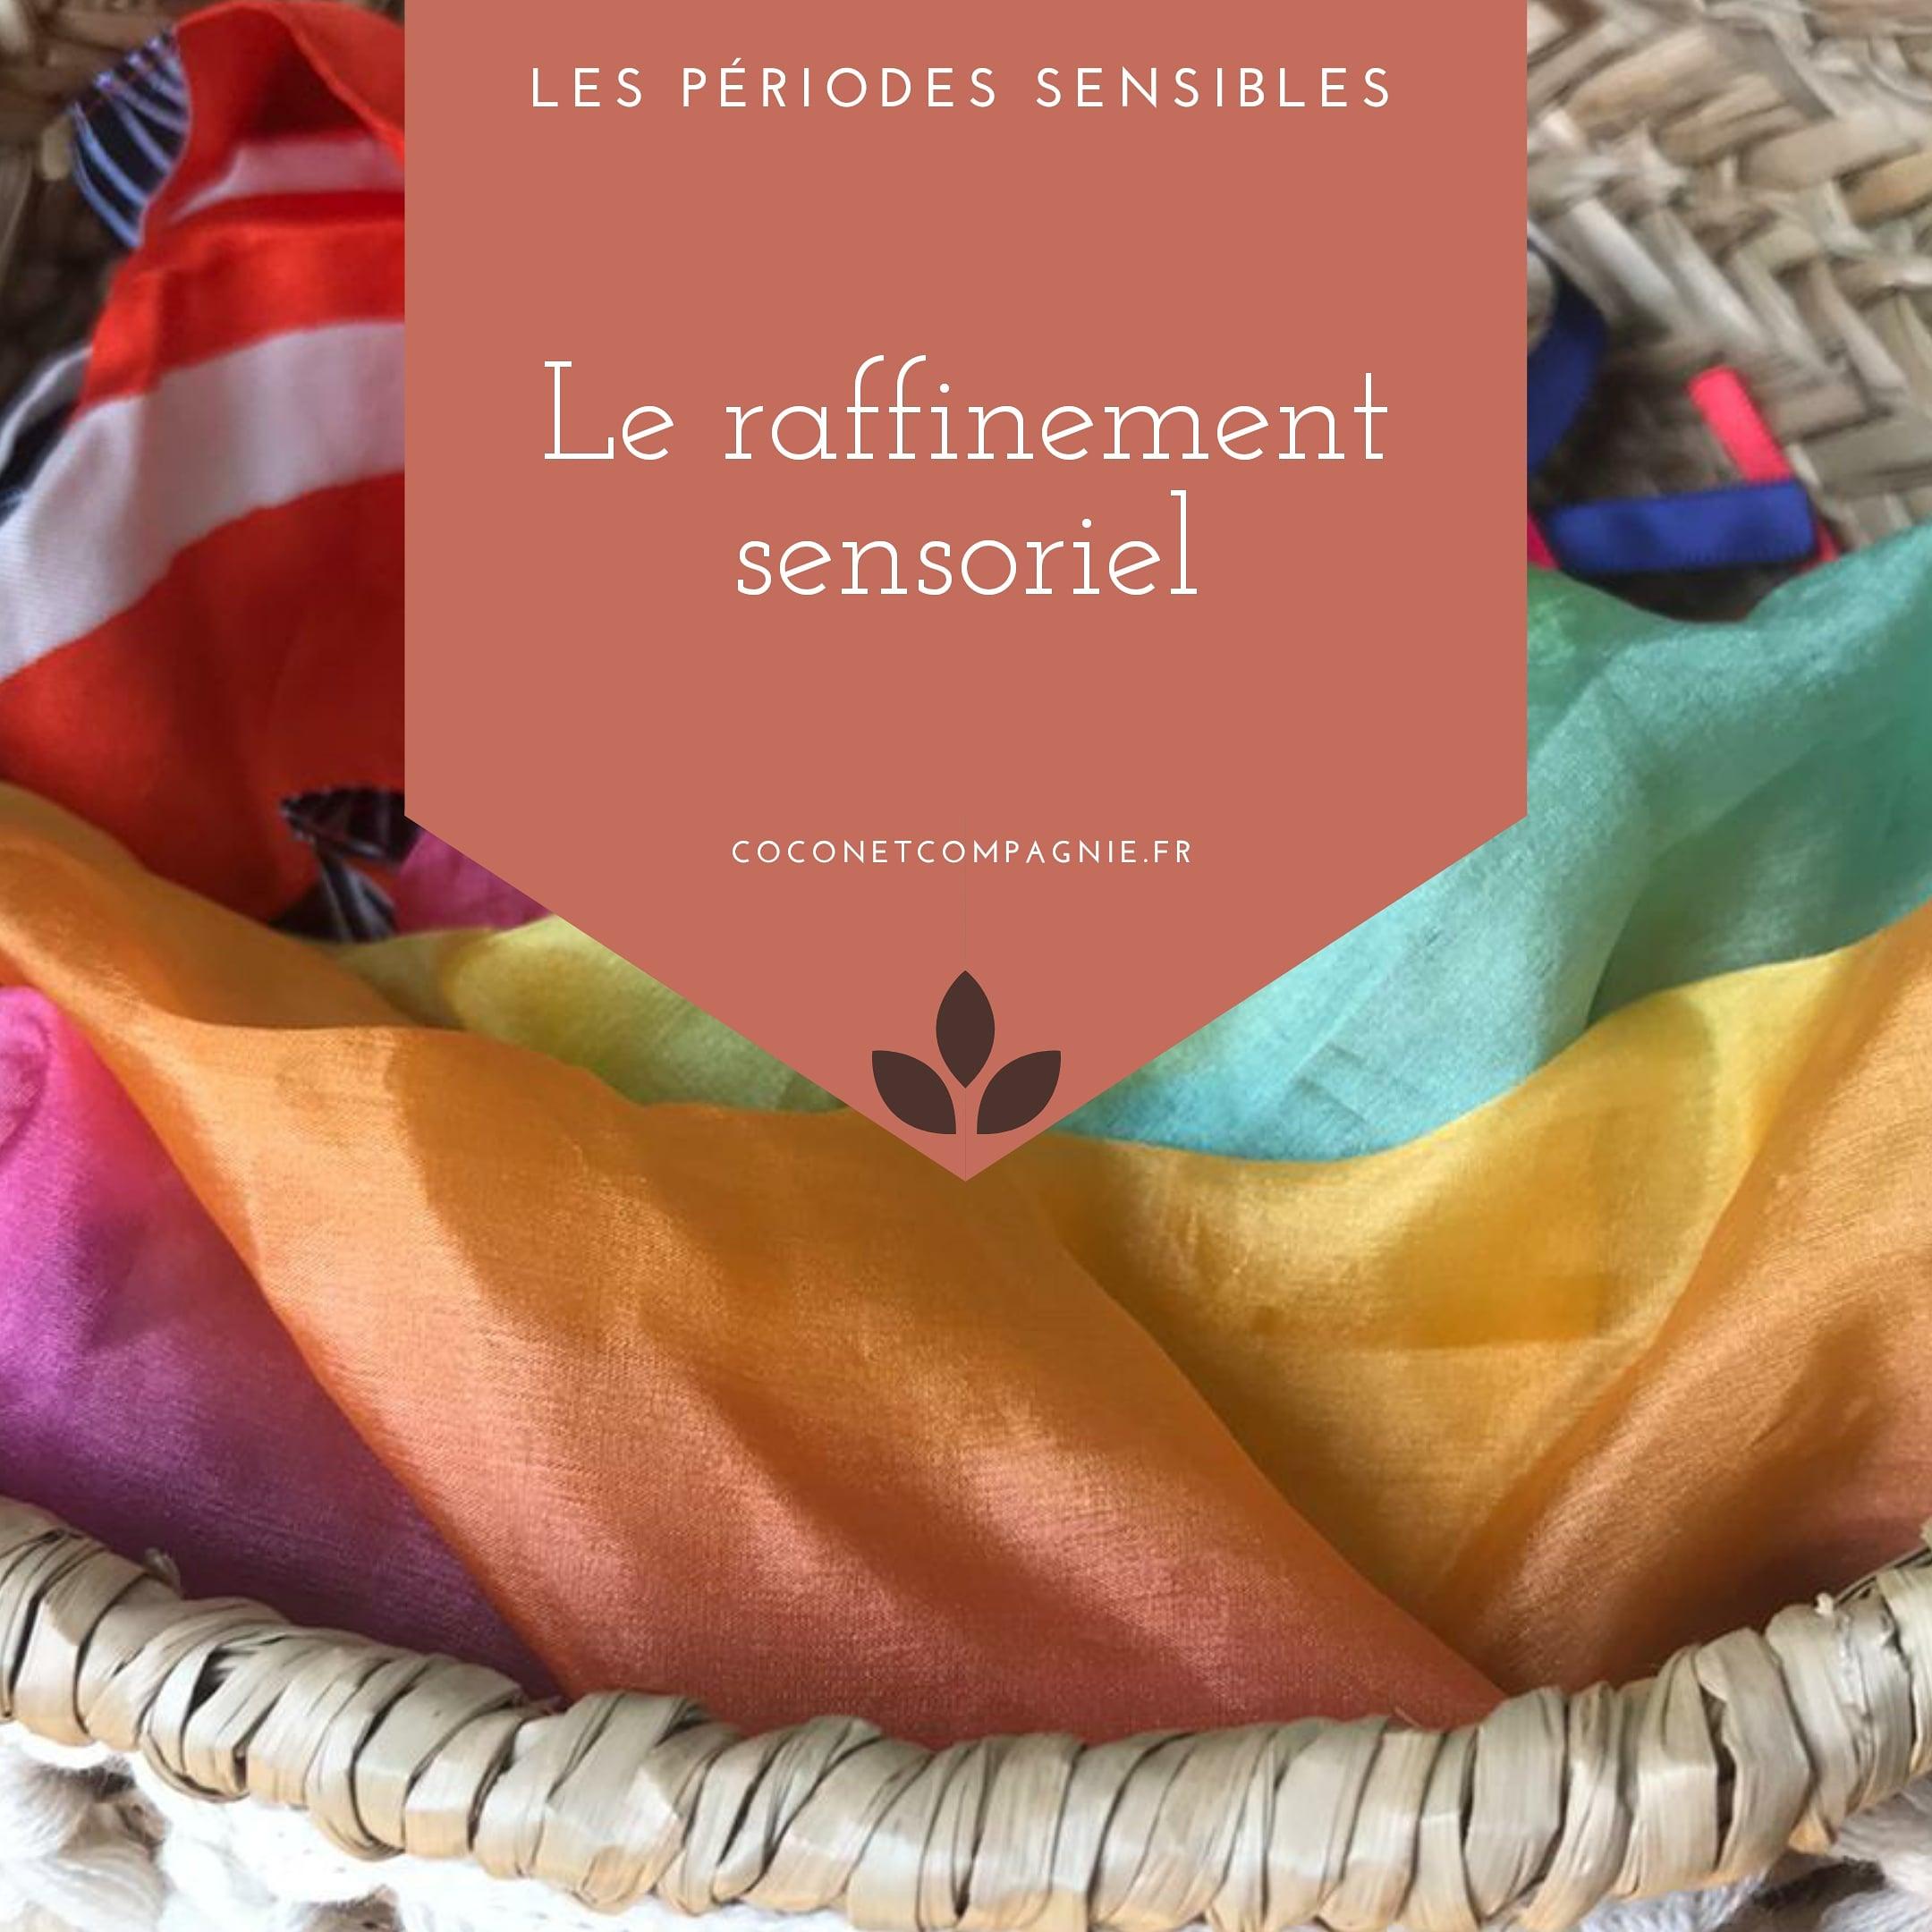 periode_sensible_raffinement_sensoriel_cocon_compagnie